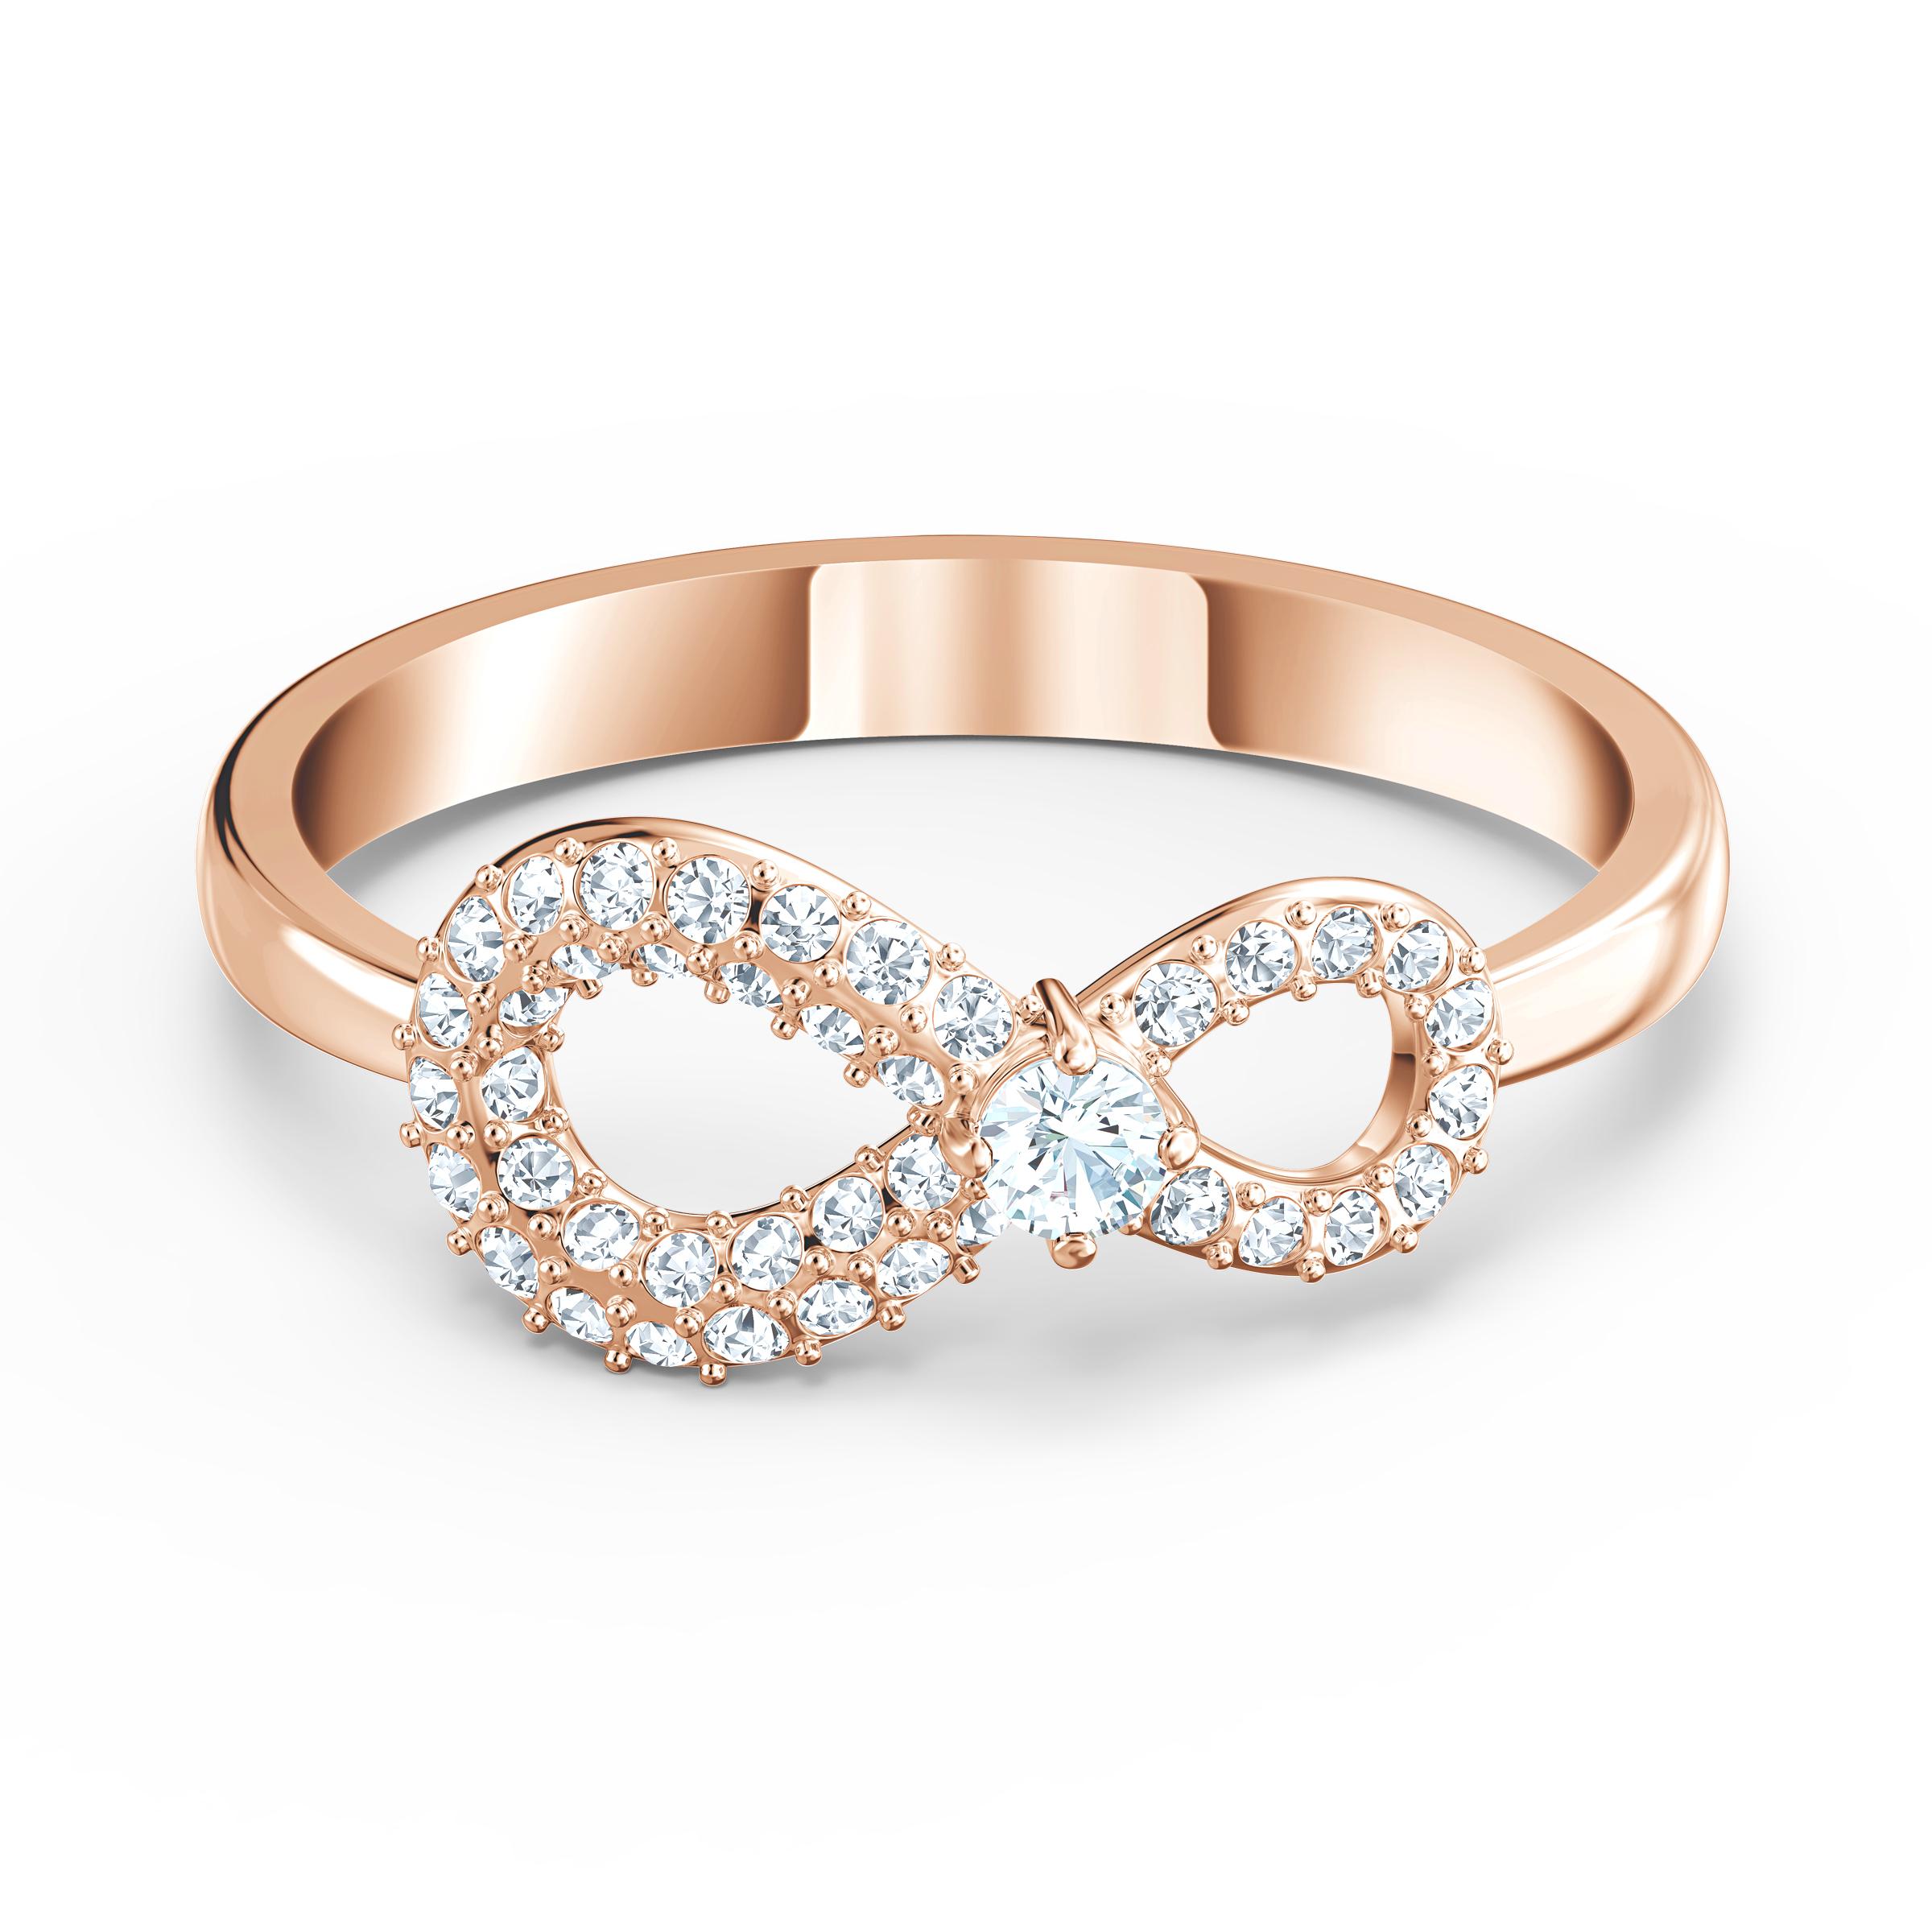 Bague Swarovski Infinity, blanc, métal doré rose, Swarovski